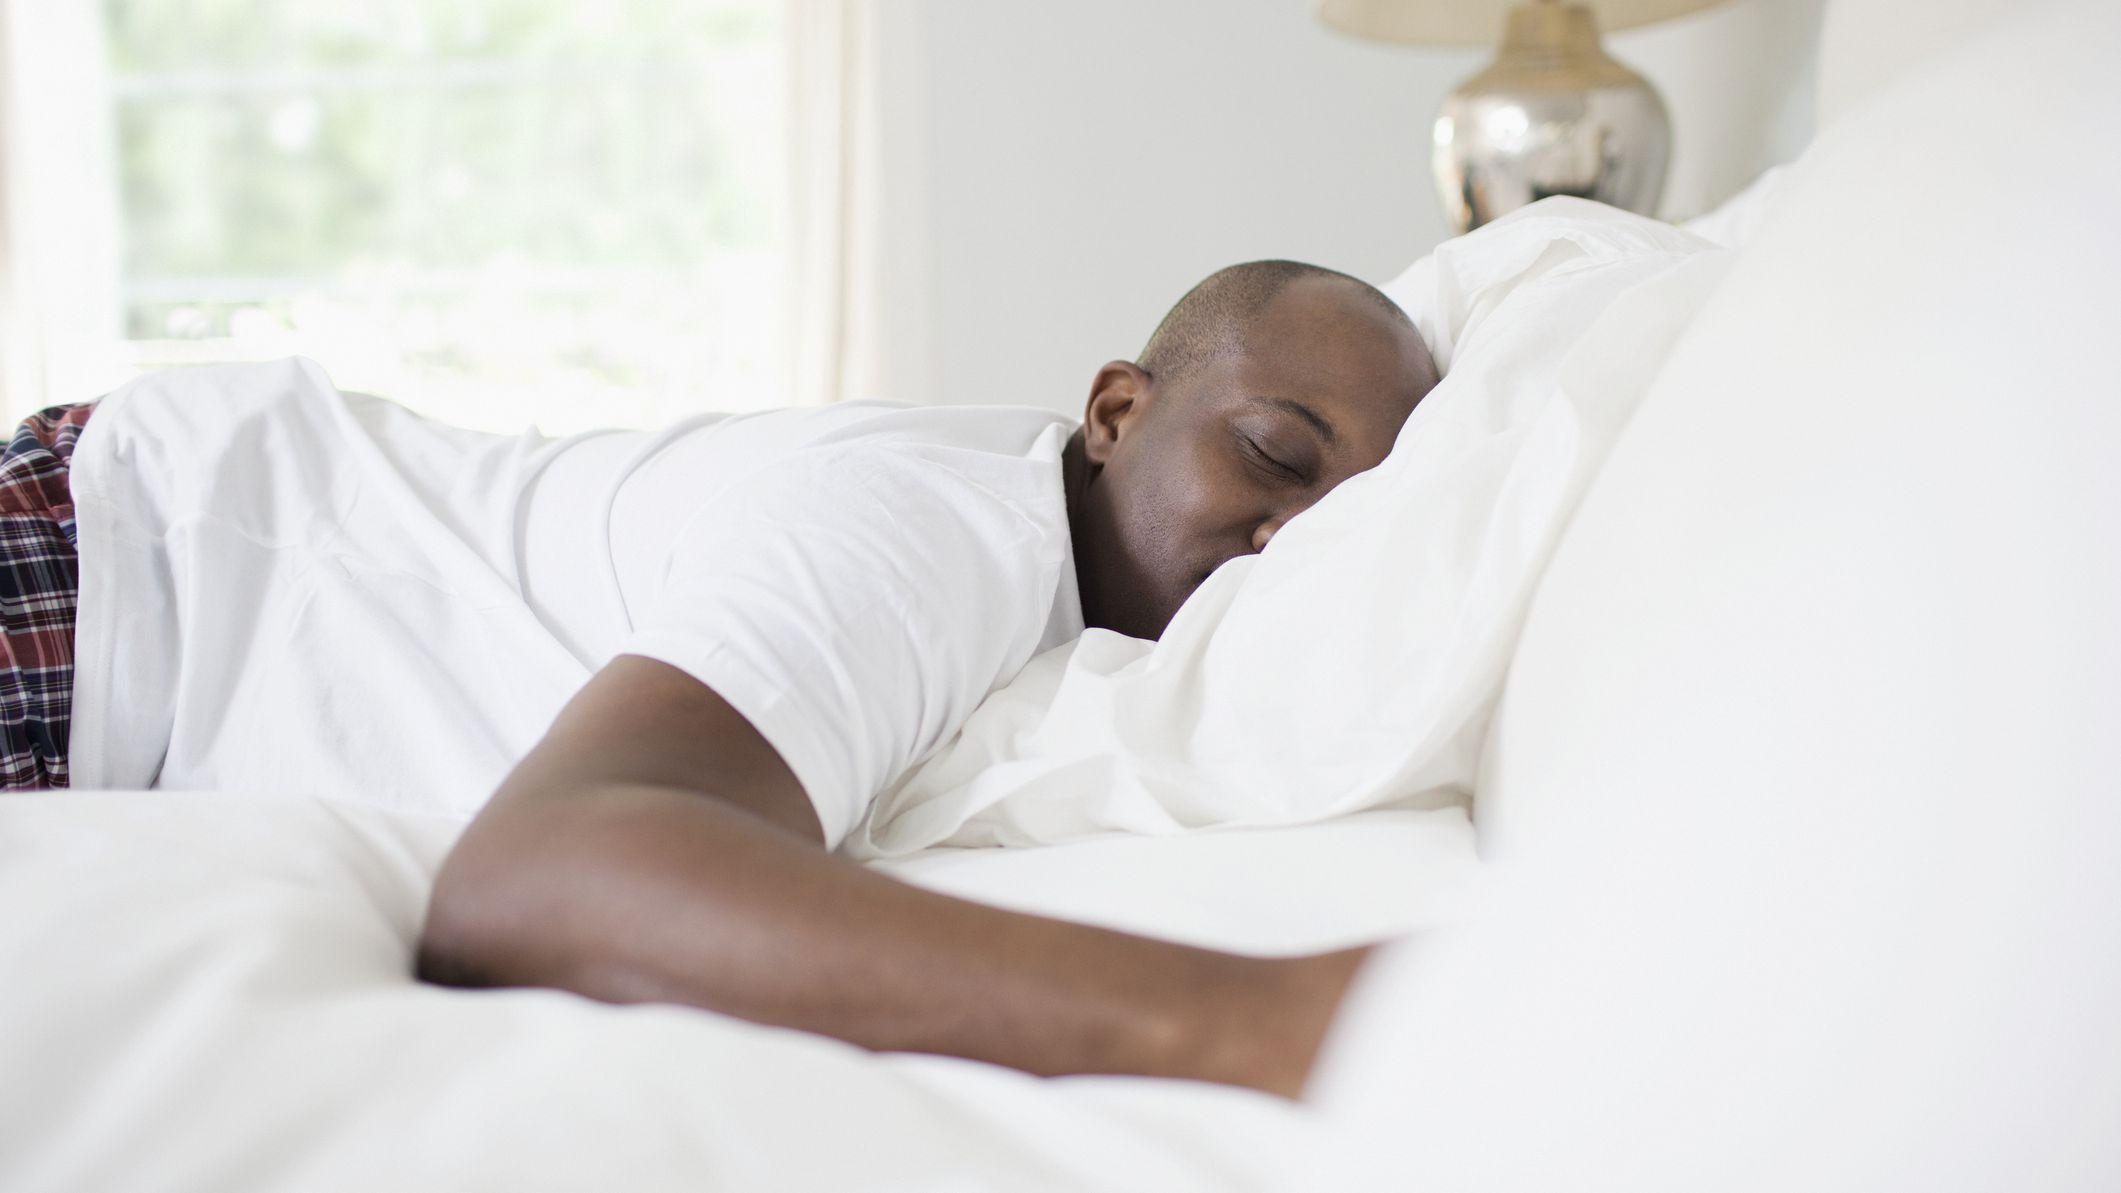 What Are the Common Symptoms of Snoring or Sleep Apnea?